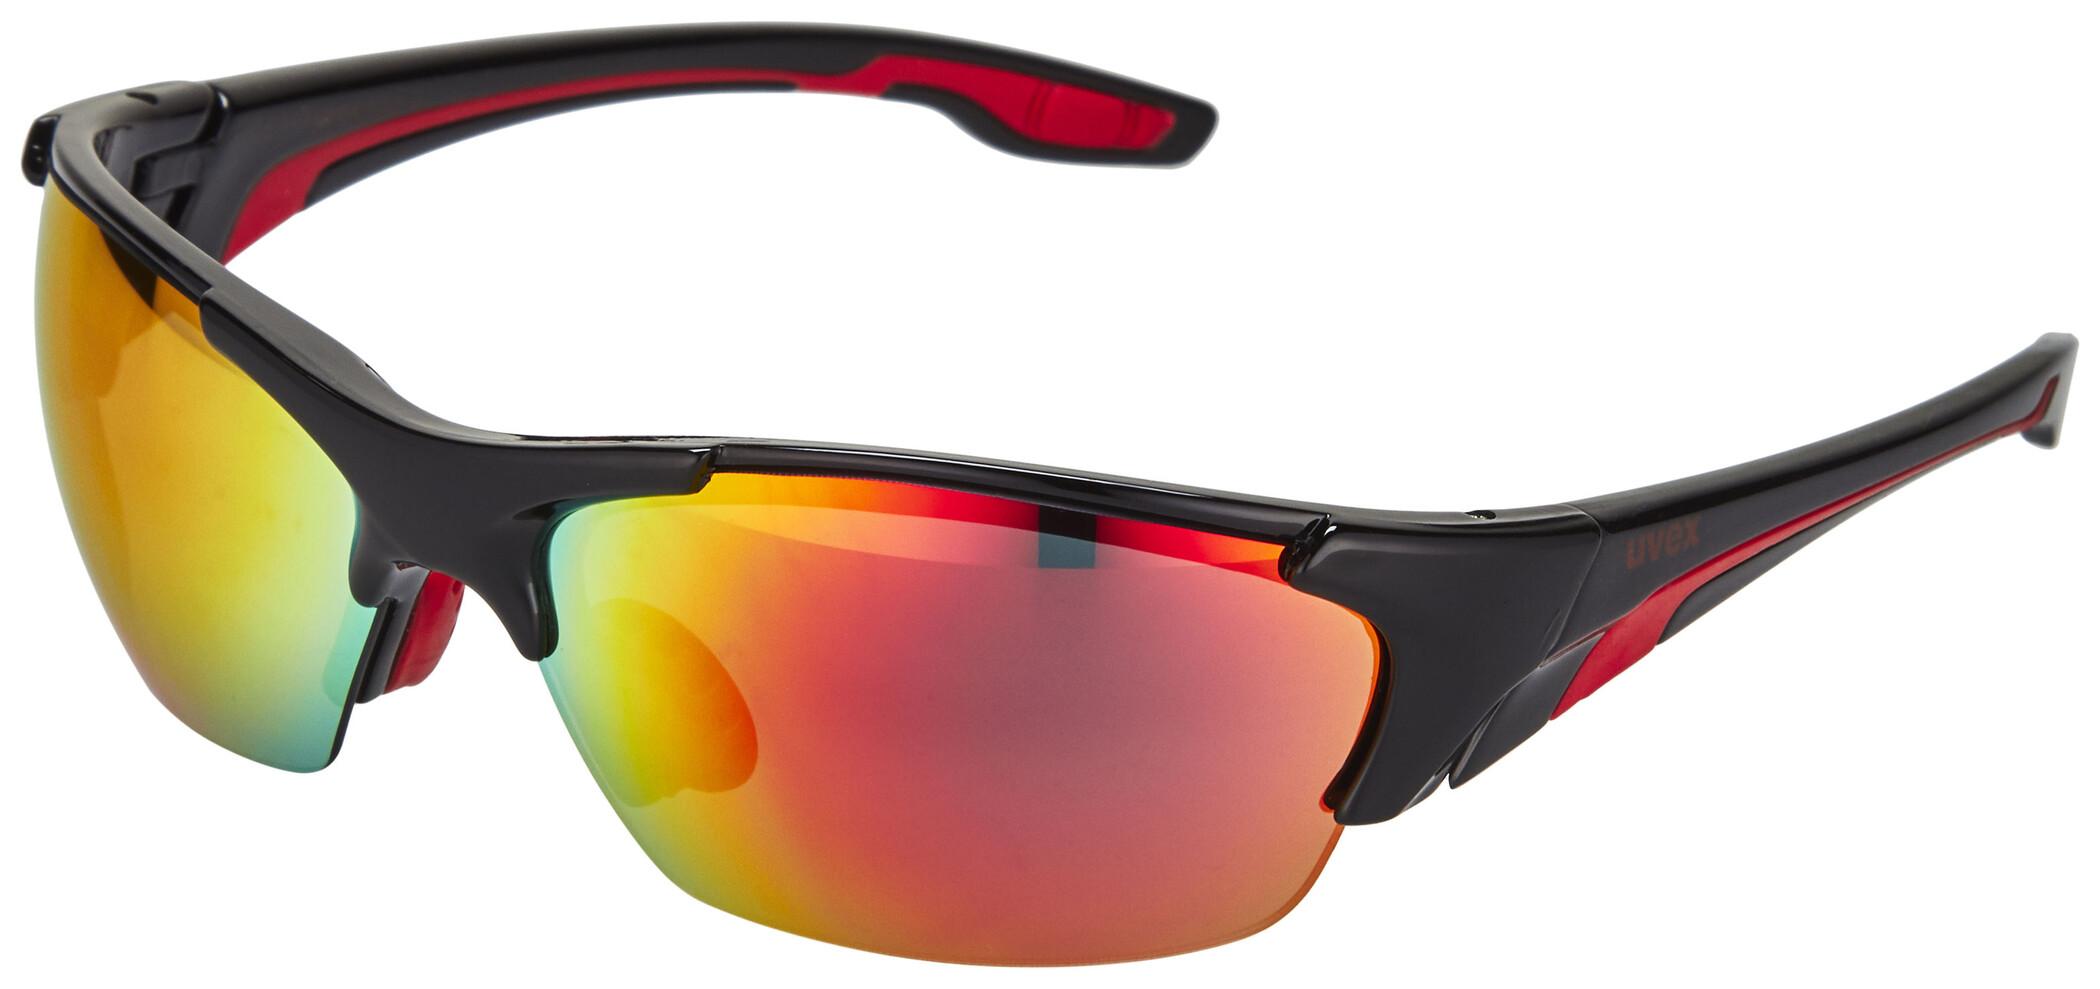 UVEX blaze lll Cykelbriller, black red (2019) | Glasses